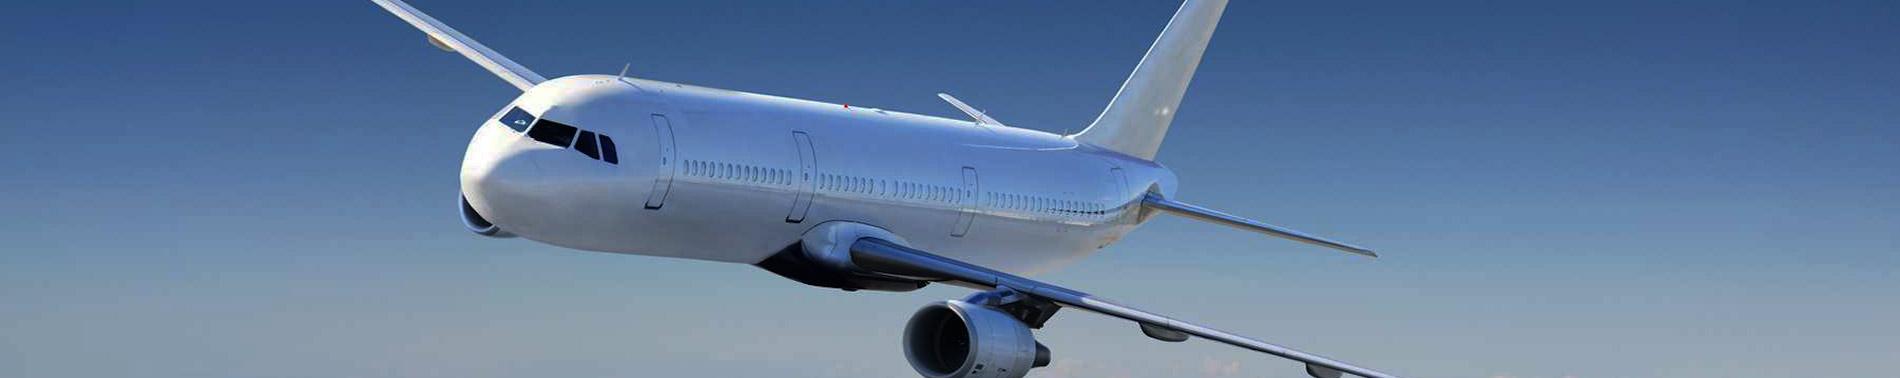 airplane-1900x378